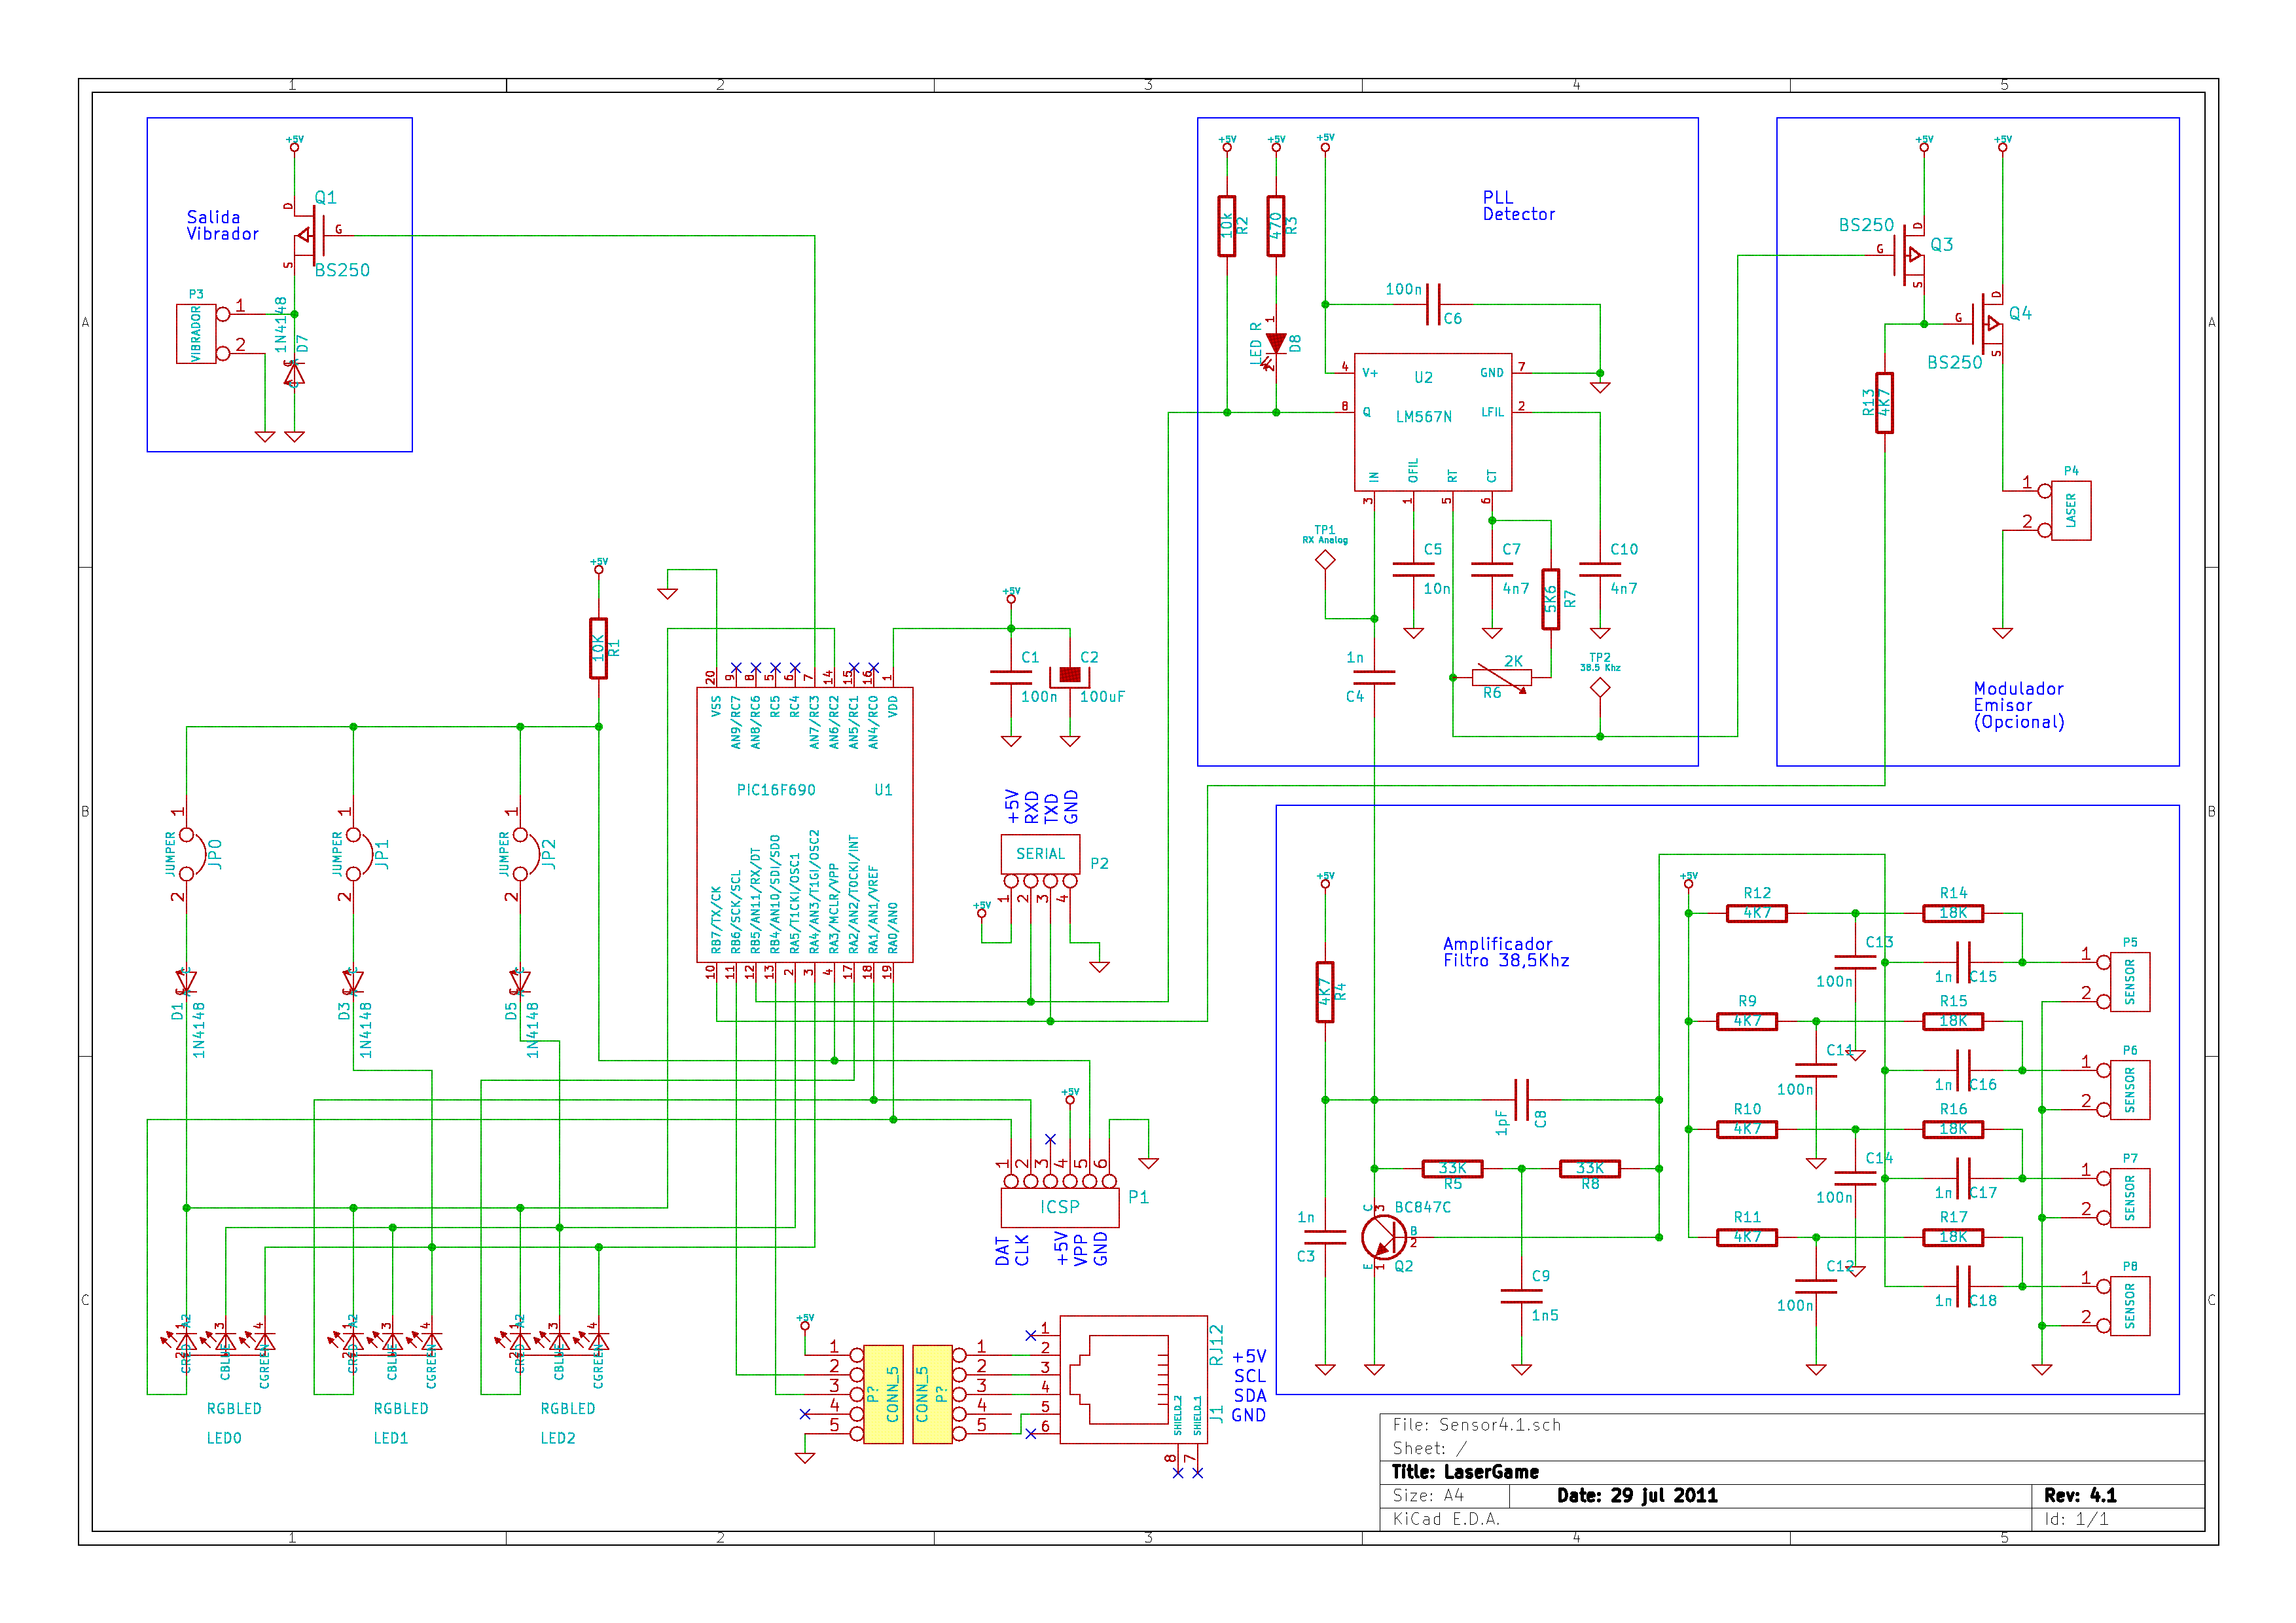 Esquema de los sensores